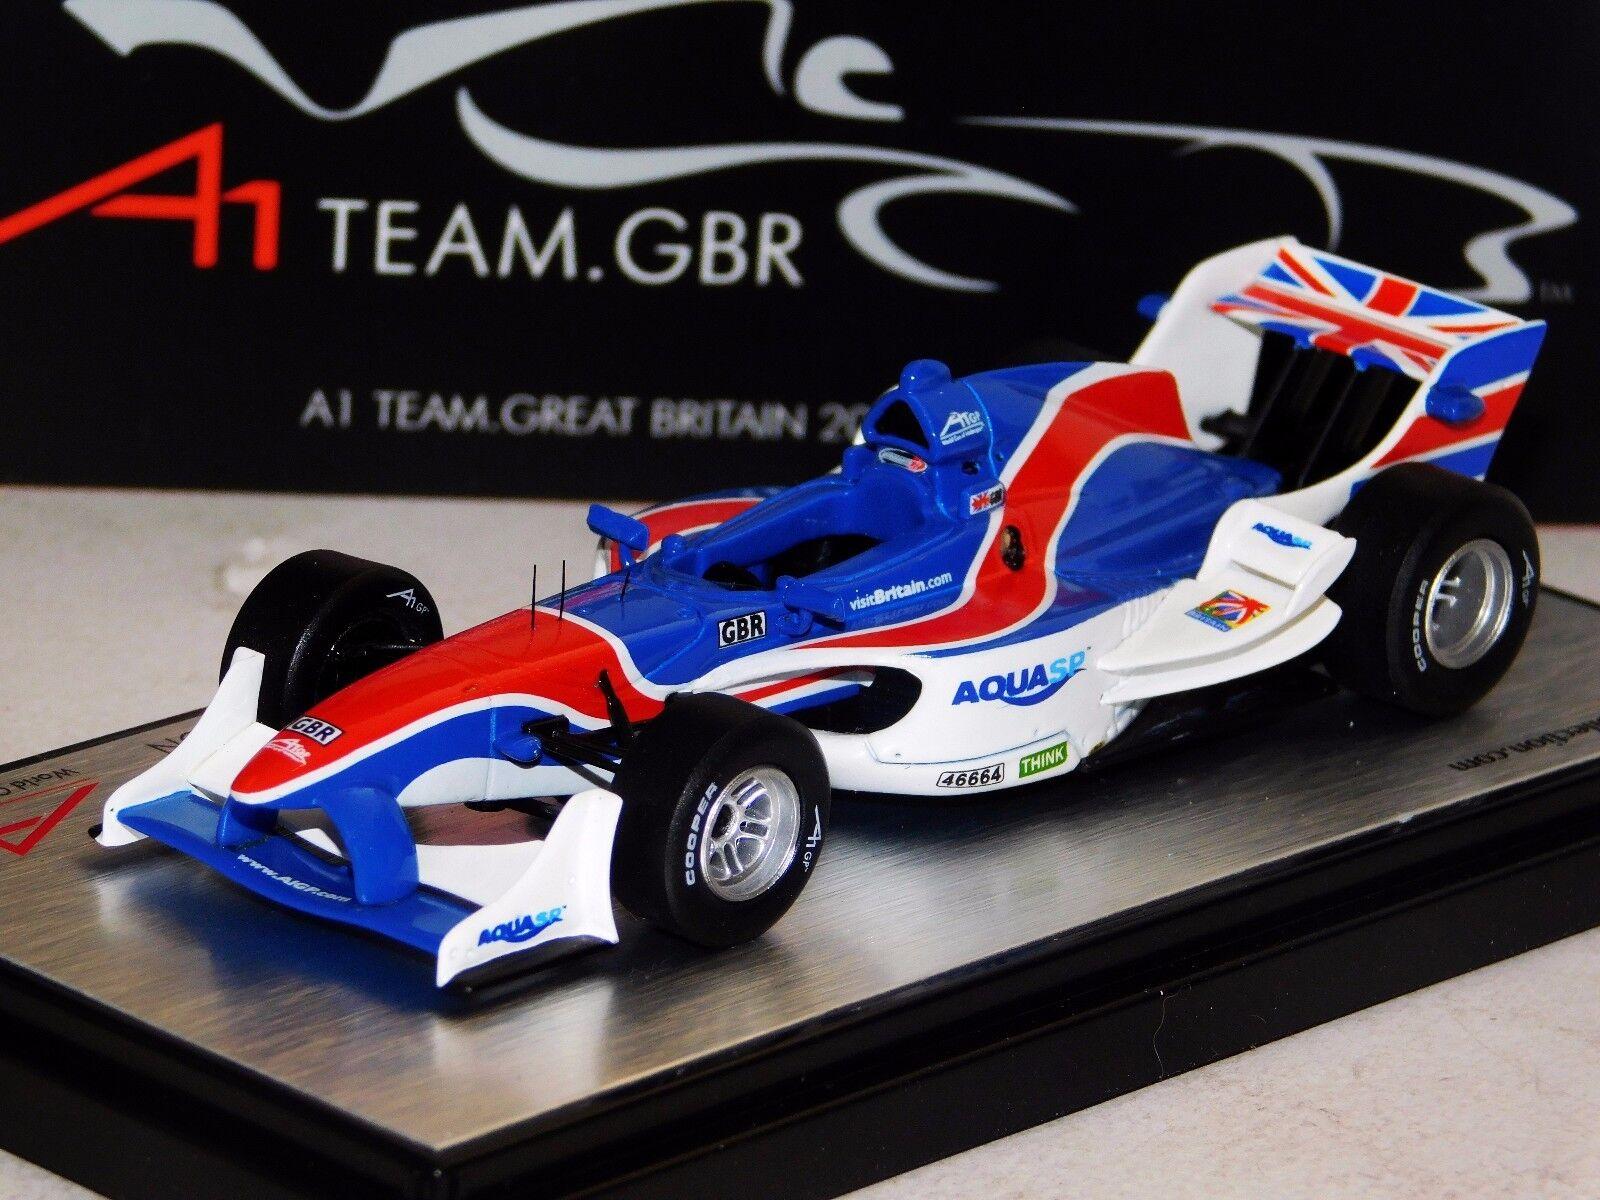 A1 GP FORMULA TEAM GREAT BRITAIN UK 2007   2008 SEASON AMALGAM  1 43